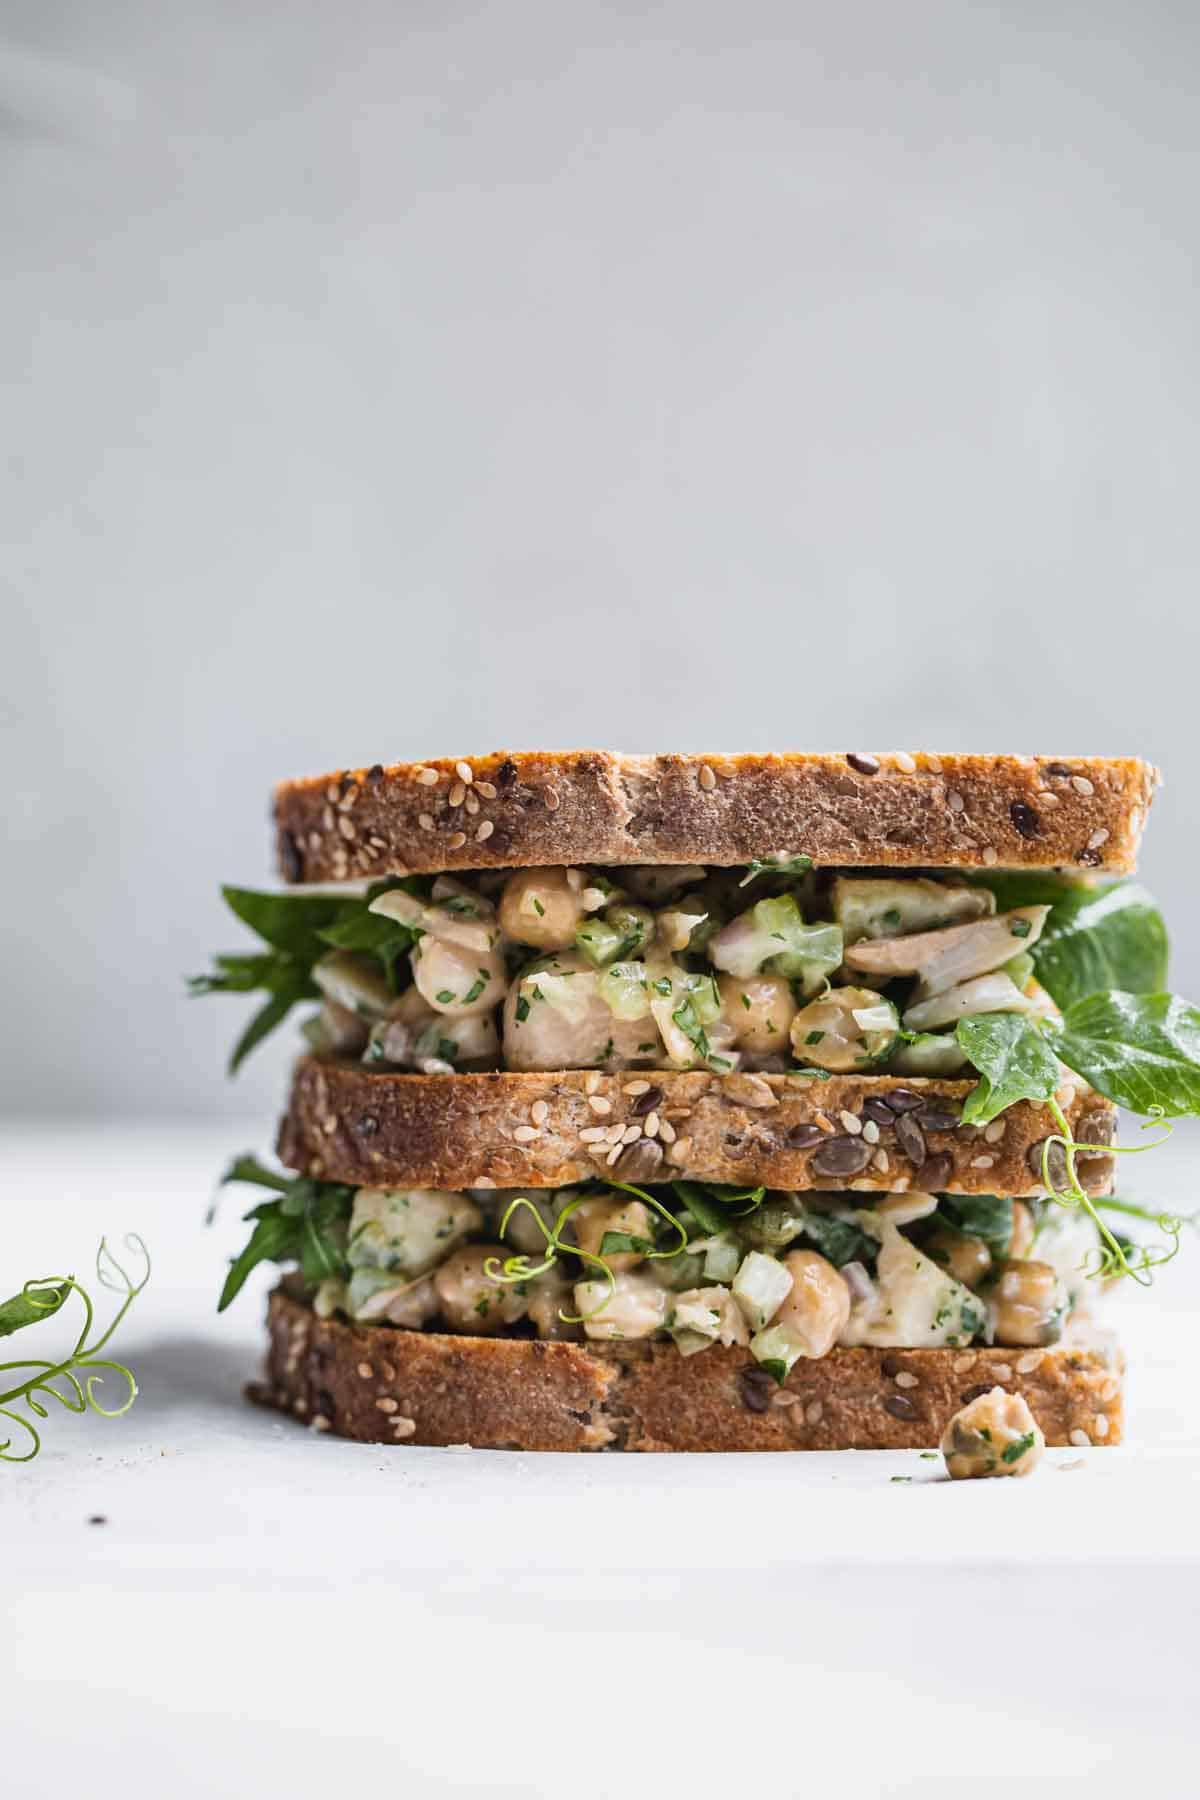 A double sandwich sitting on a white board.